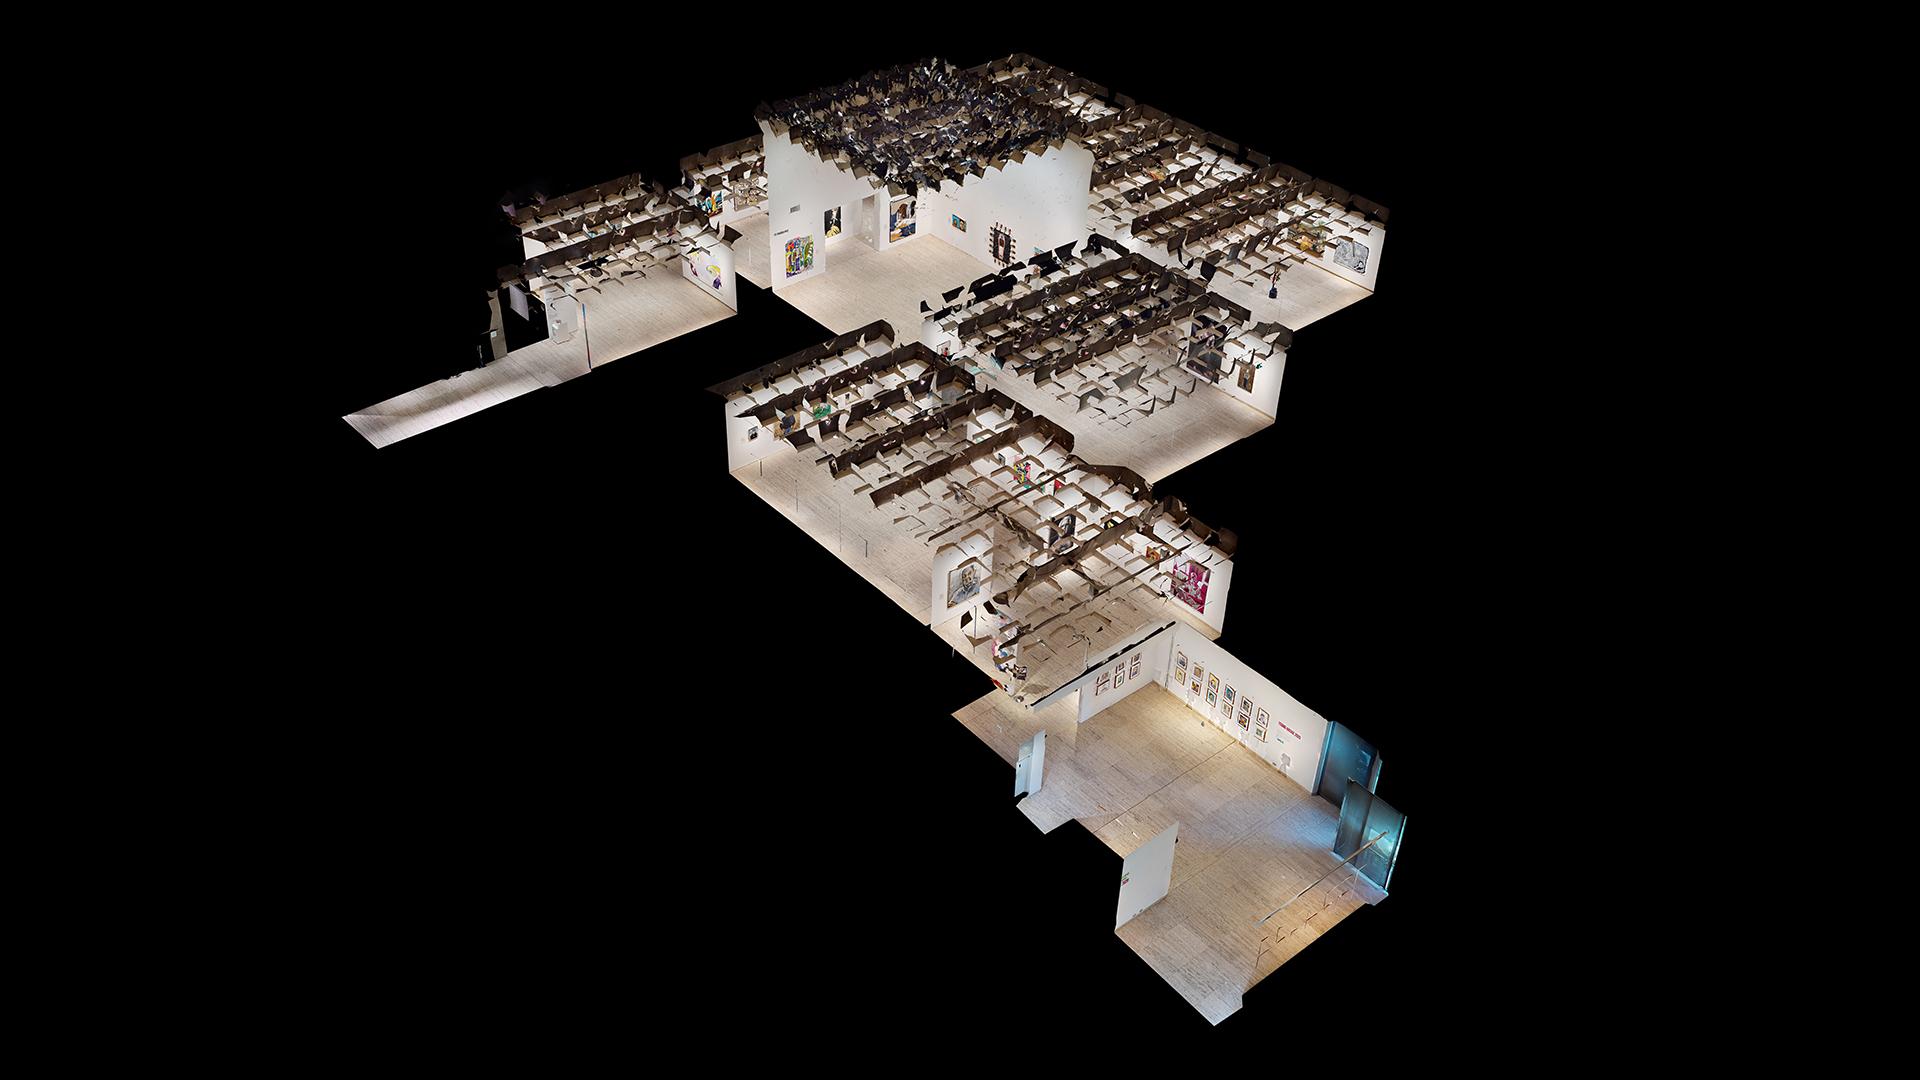 Archibald Prize Virtual Tour Matterport Dollhouse View